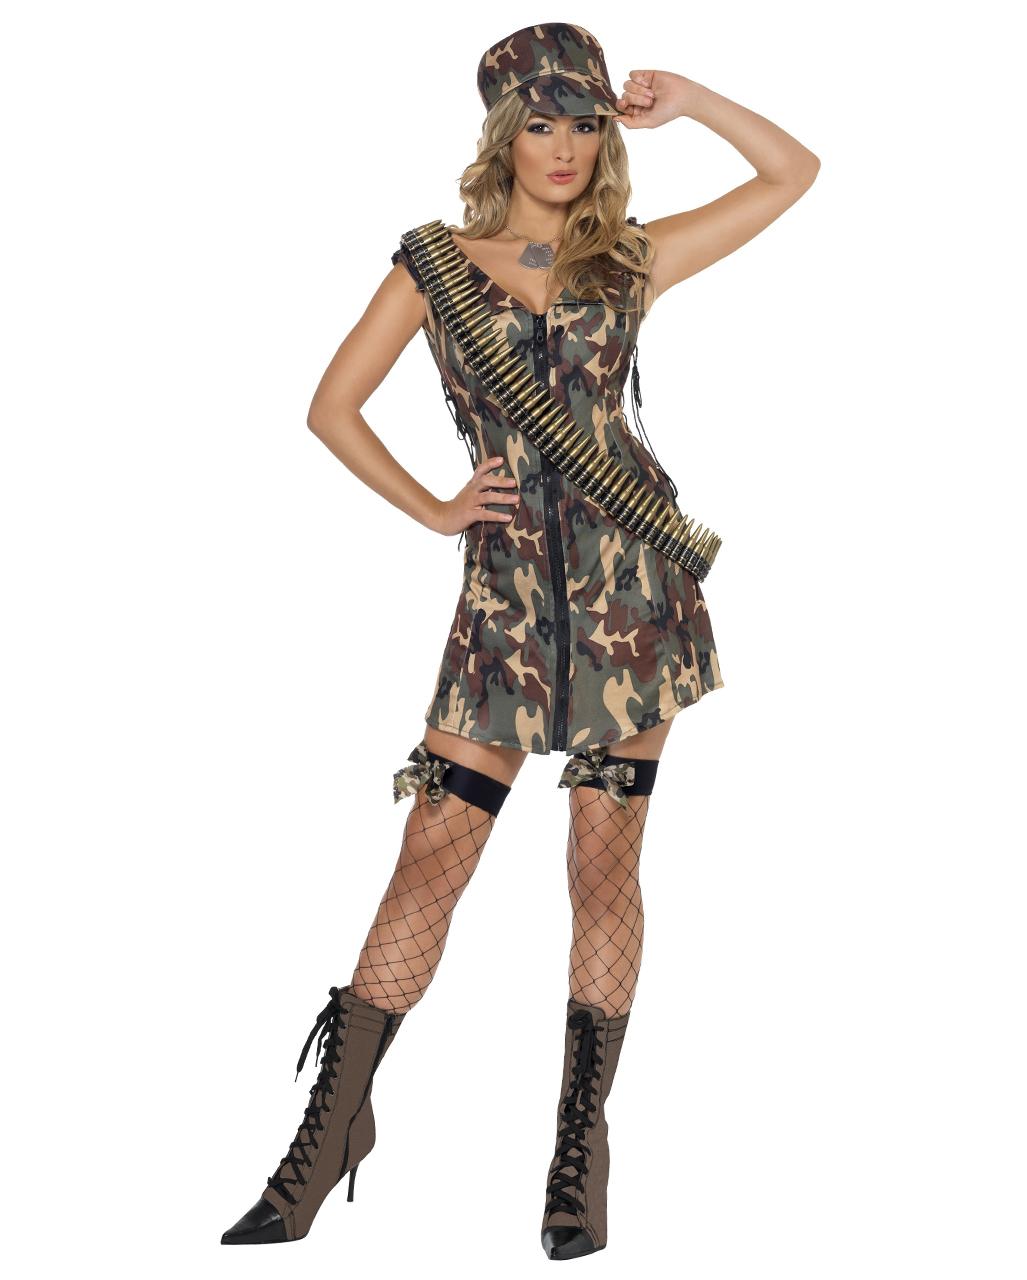 hot army girl kost m sexy milit runiform karneval universe. Black Bedroom Furniture Sets. Home Design Ideas